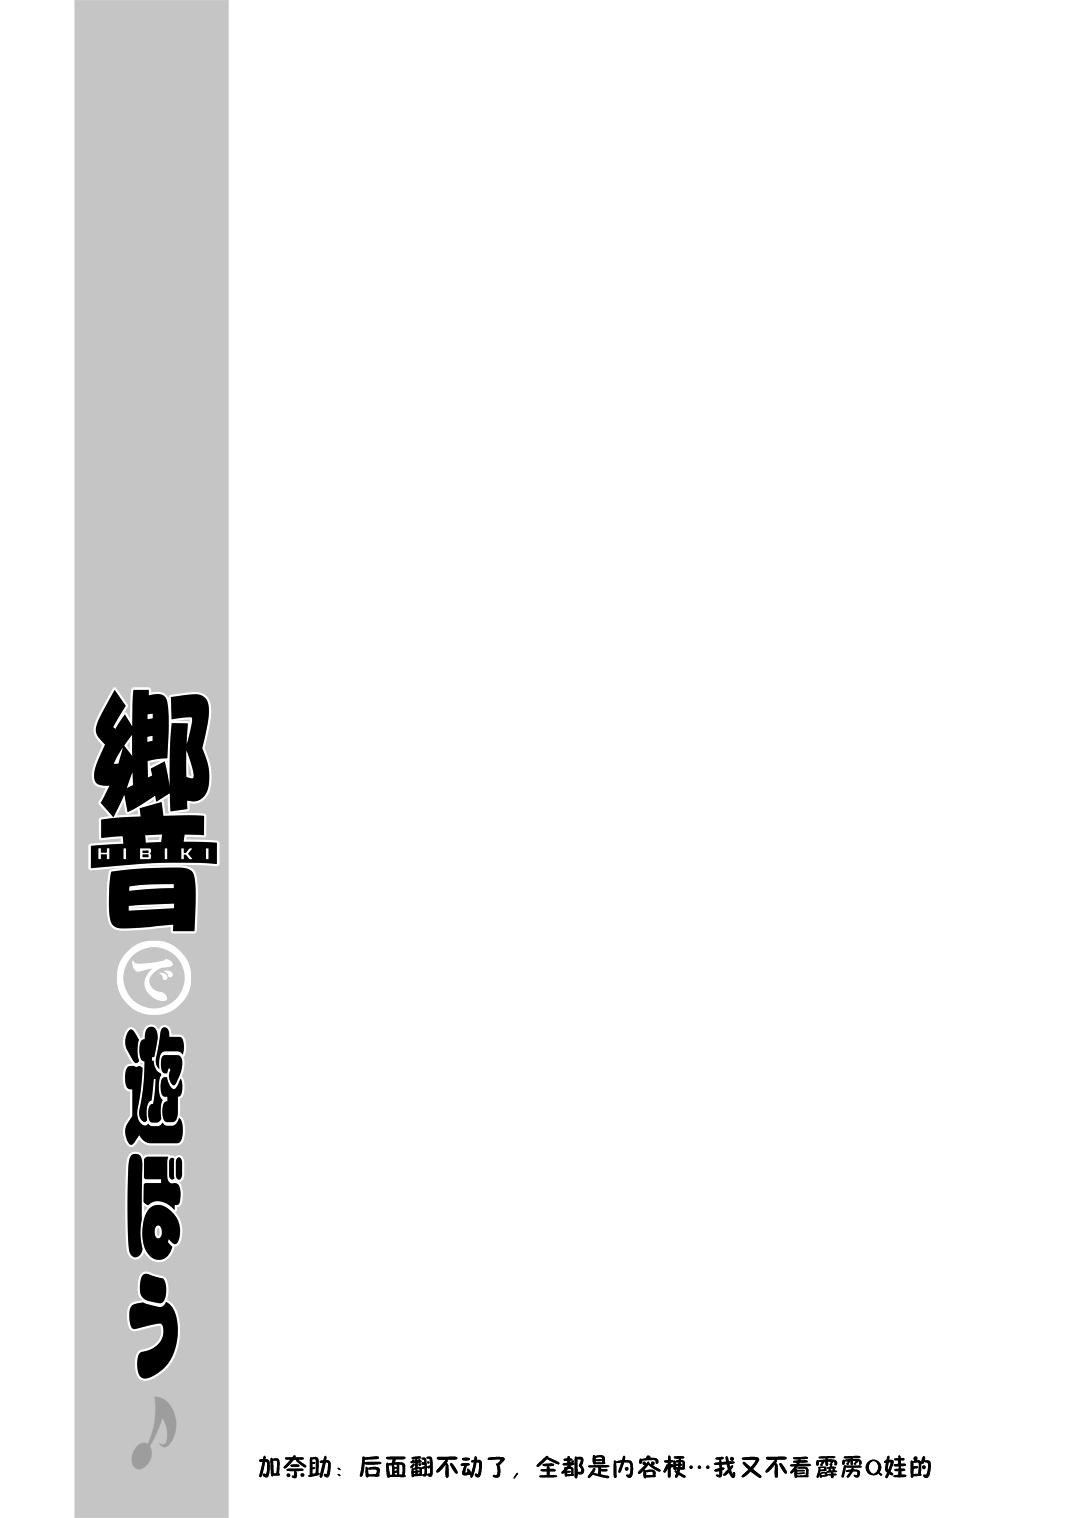 Hibiki de asobou ♪ 34